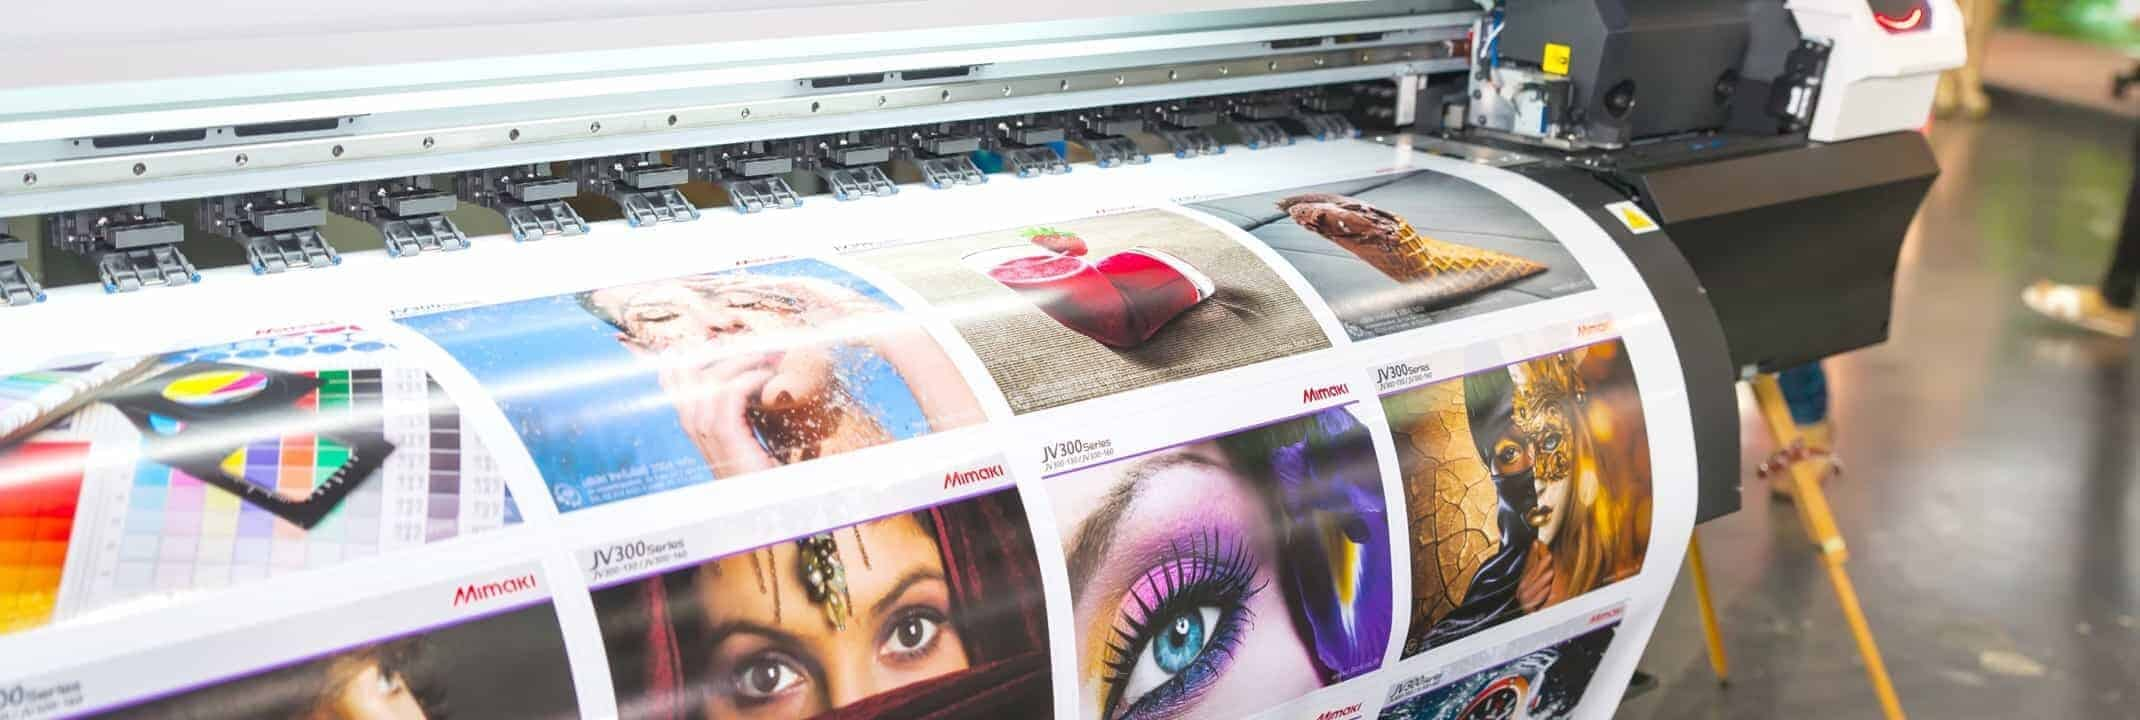 Best Professional Photo Printers (Amazing 10 Picks)